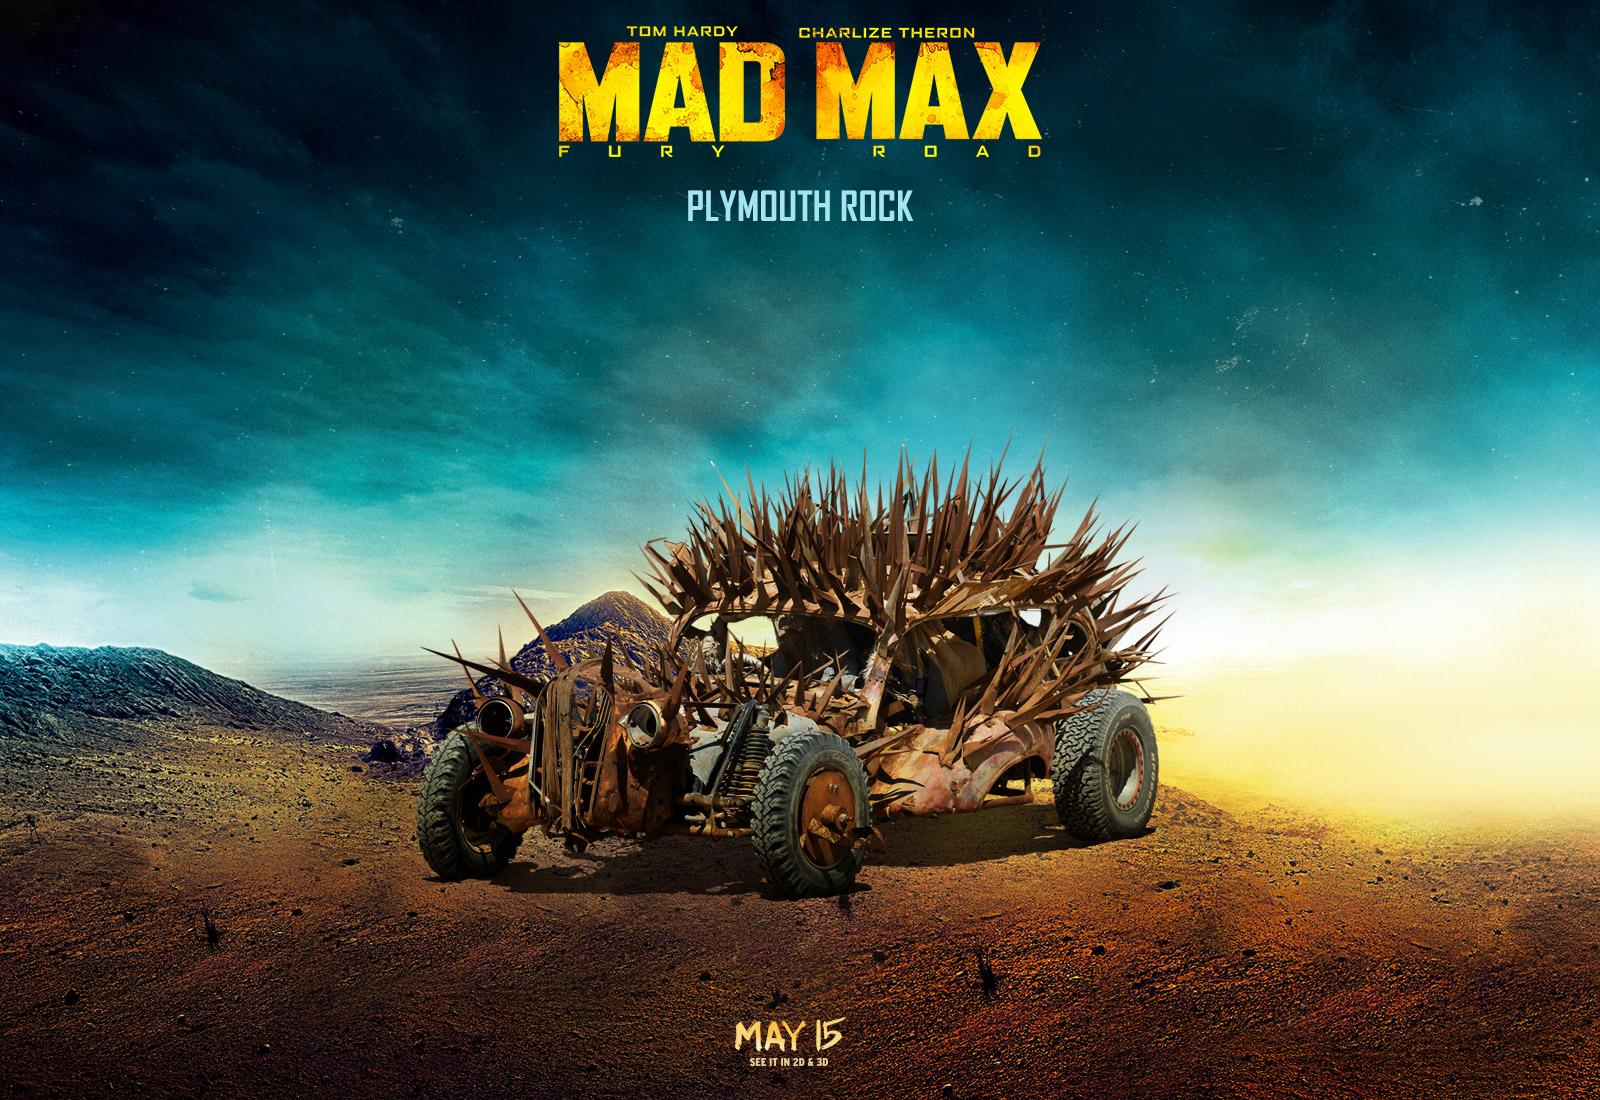 mad max fury road plymouth rock